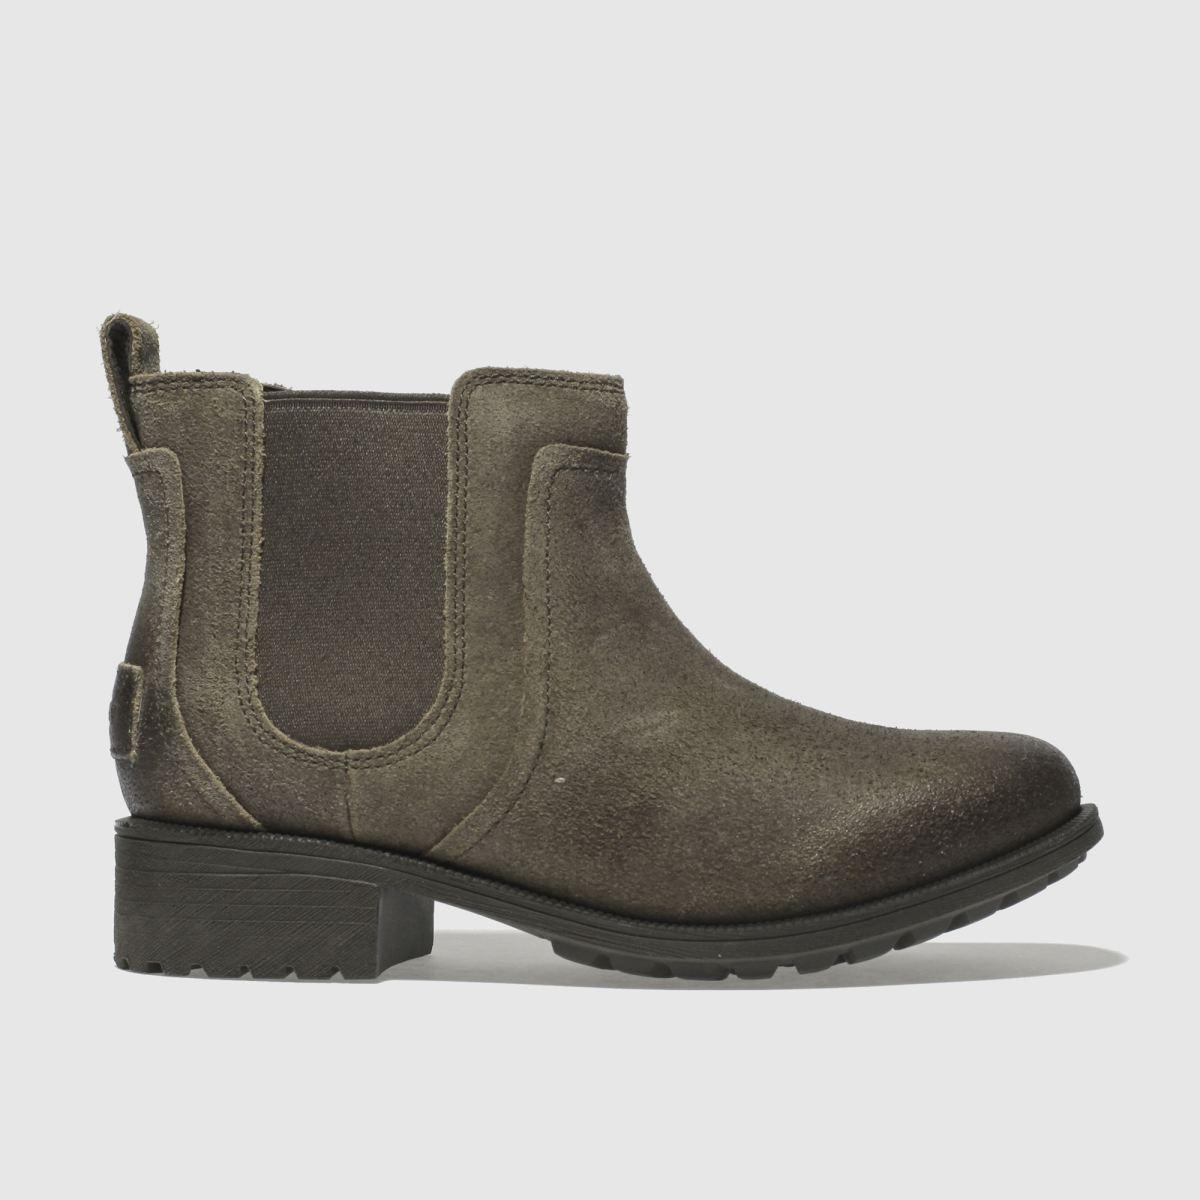 Ugg Brown Bonham Ii Boots